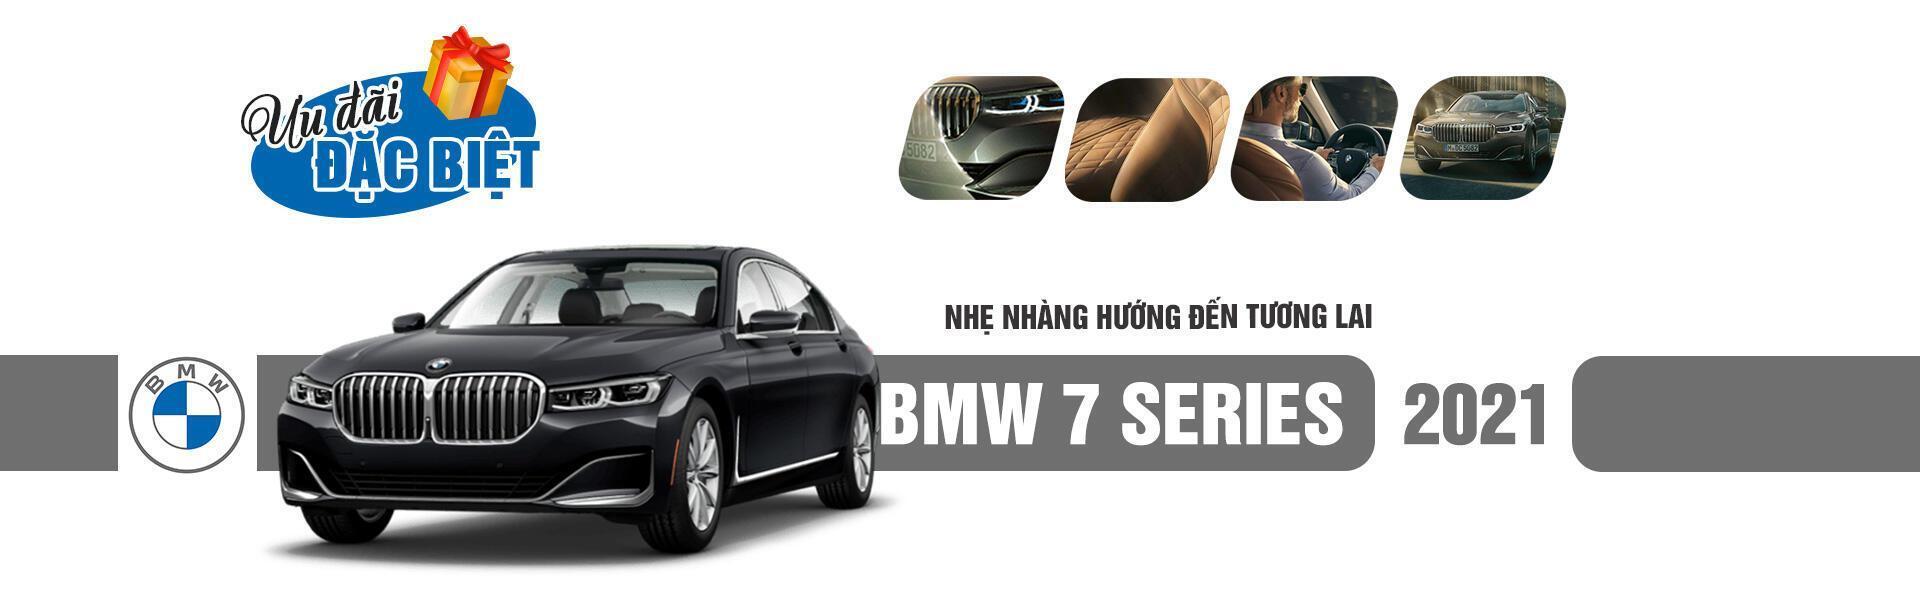 Xem chi tiết BMW Series 7 2021